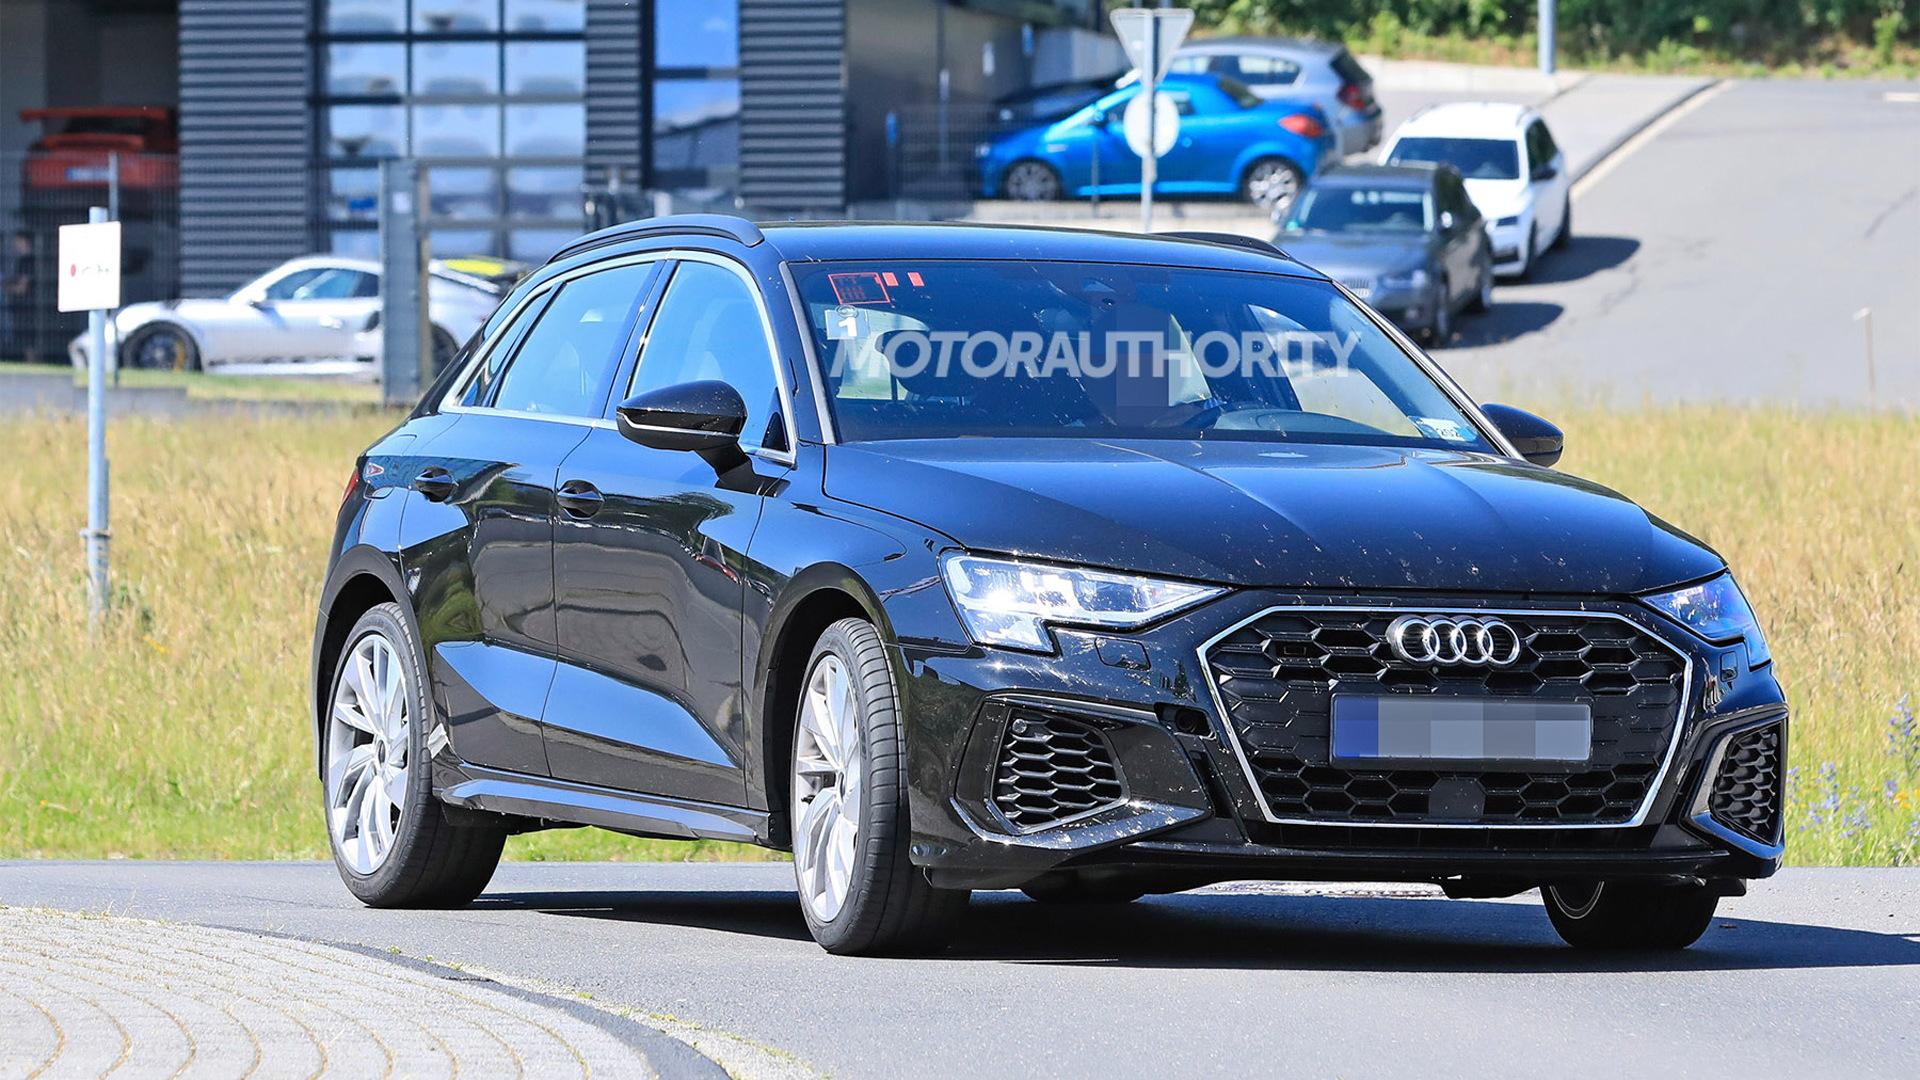 2021 Audi S3 Sportback spy shots - Photo credit:S. Baldauf/SB-Medien